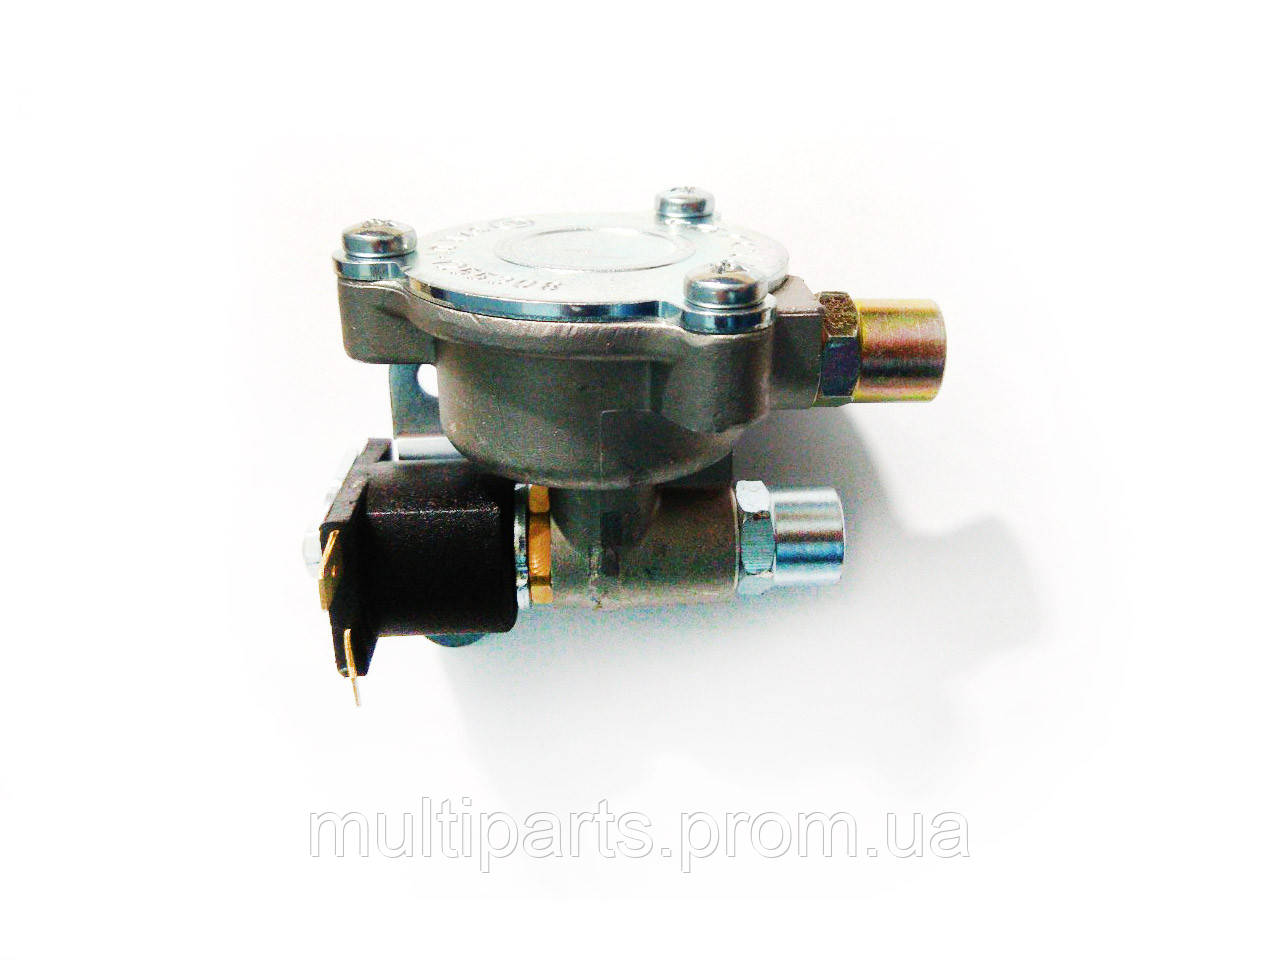 Электромагнитный клапан газа Torelli алюминий вх. вых. 6 мм